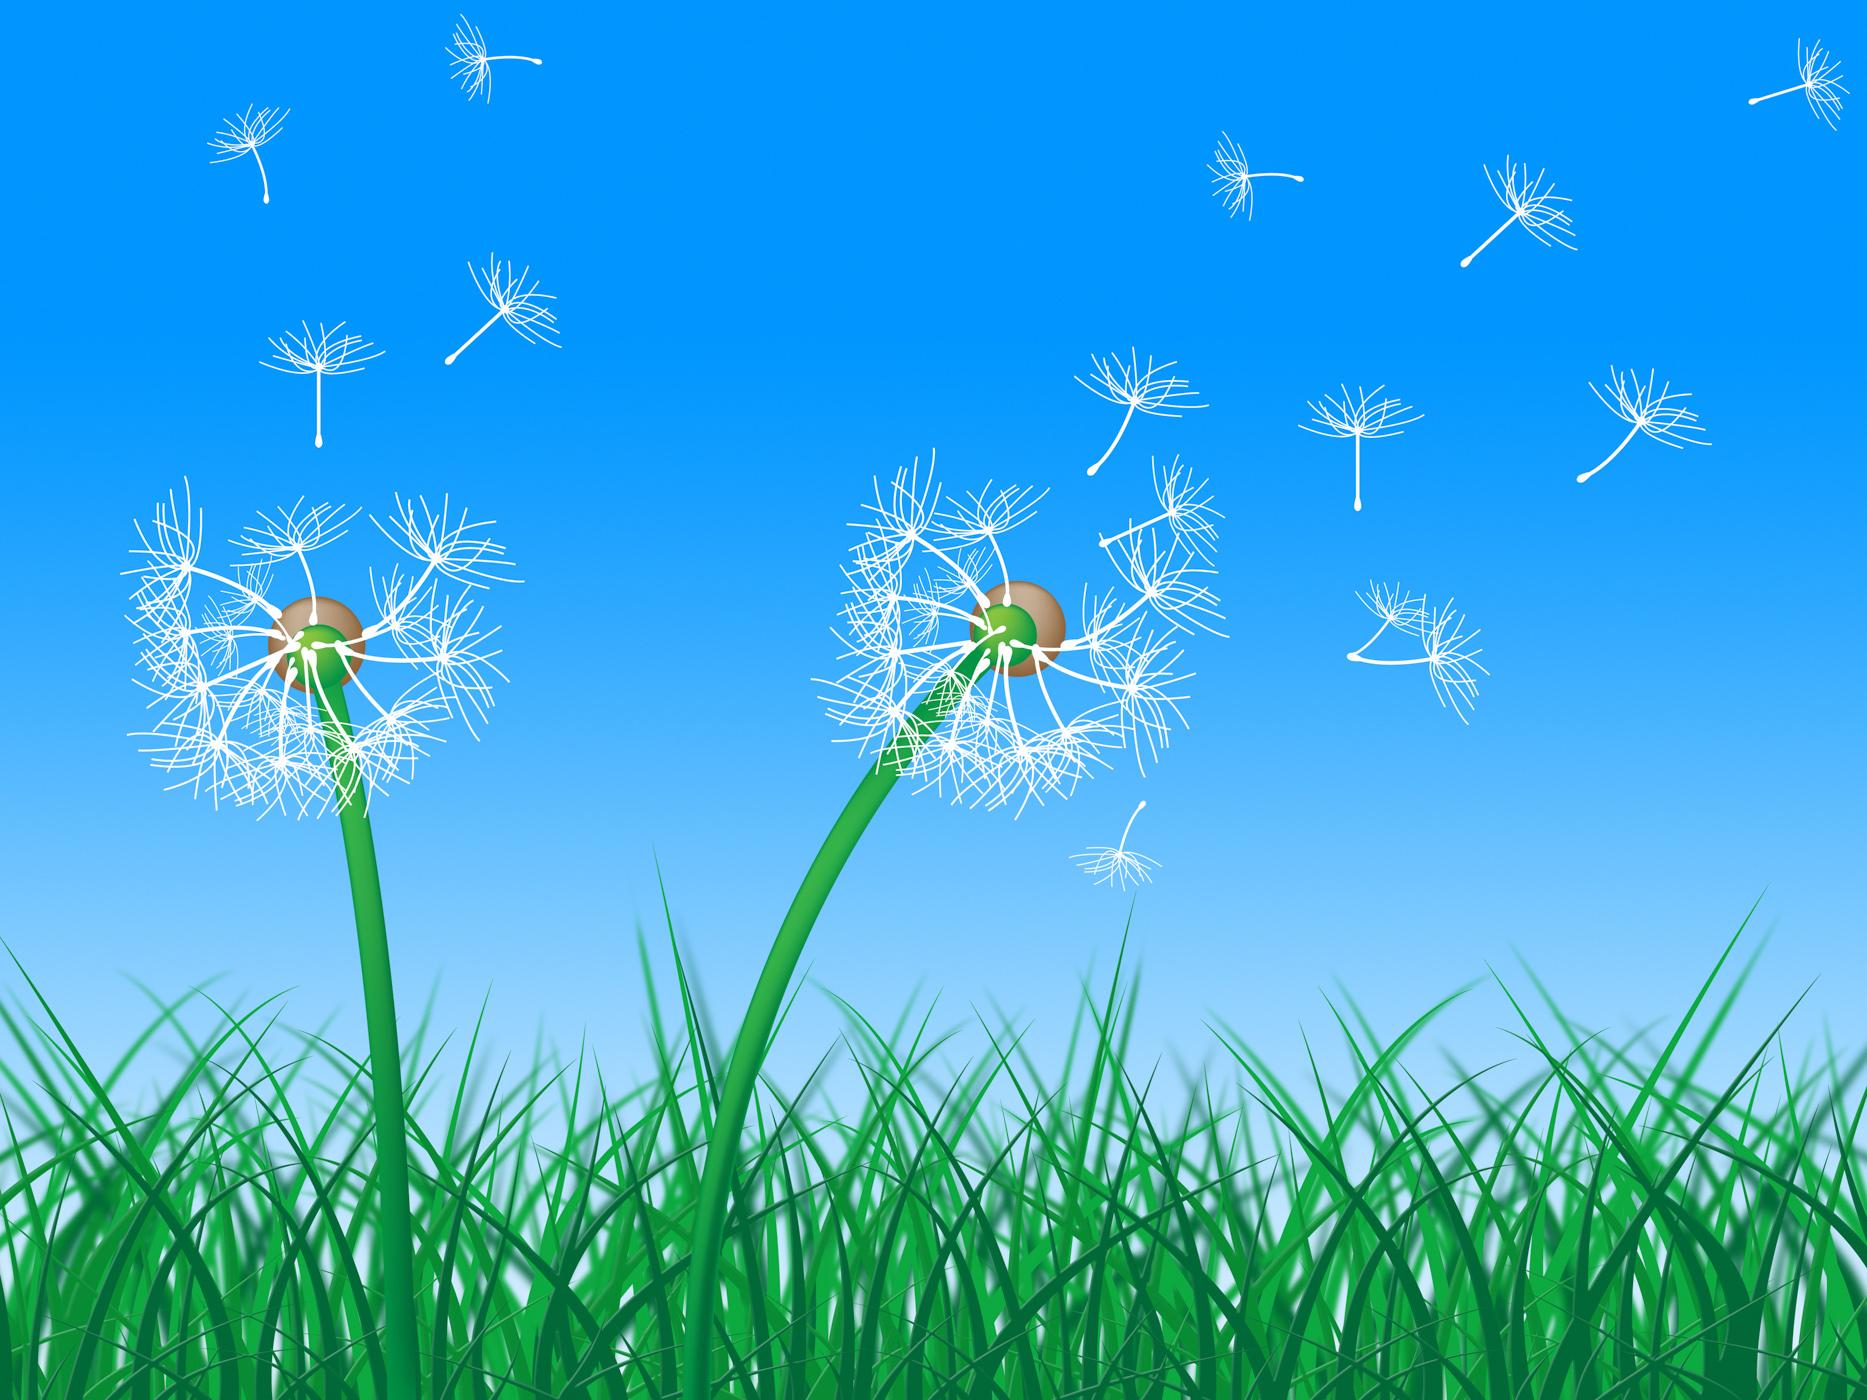 Sky grass represents dandelion hair and dandelions photo